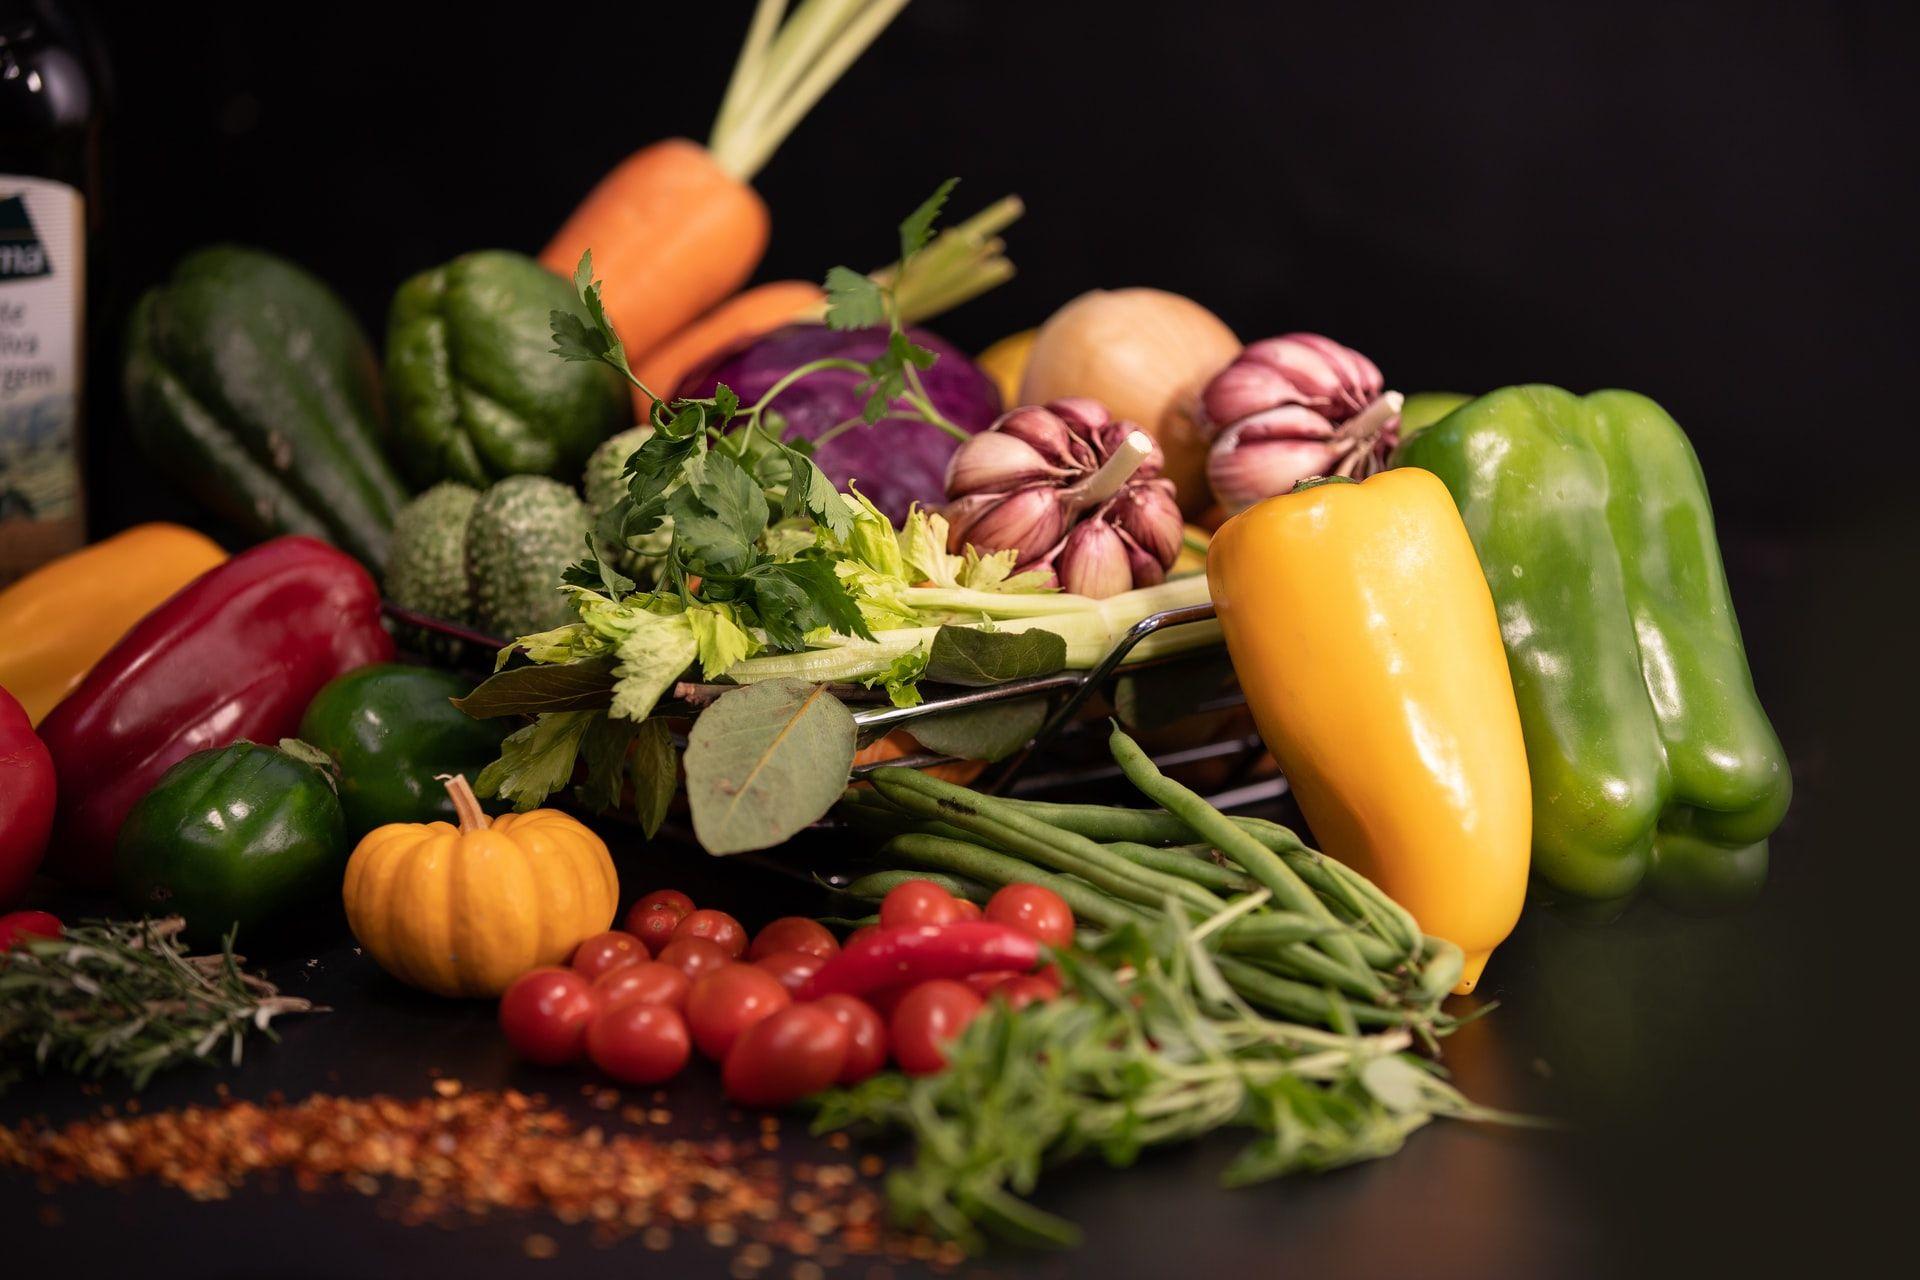 Sayang Bumi, 3 Cara Efektif Kurangi Limbah Makanan yang Bisa Kamu Coba